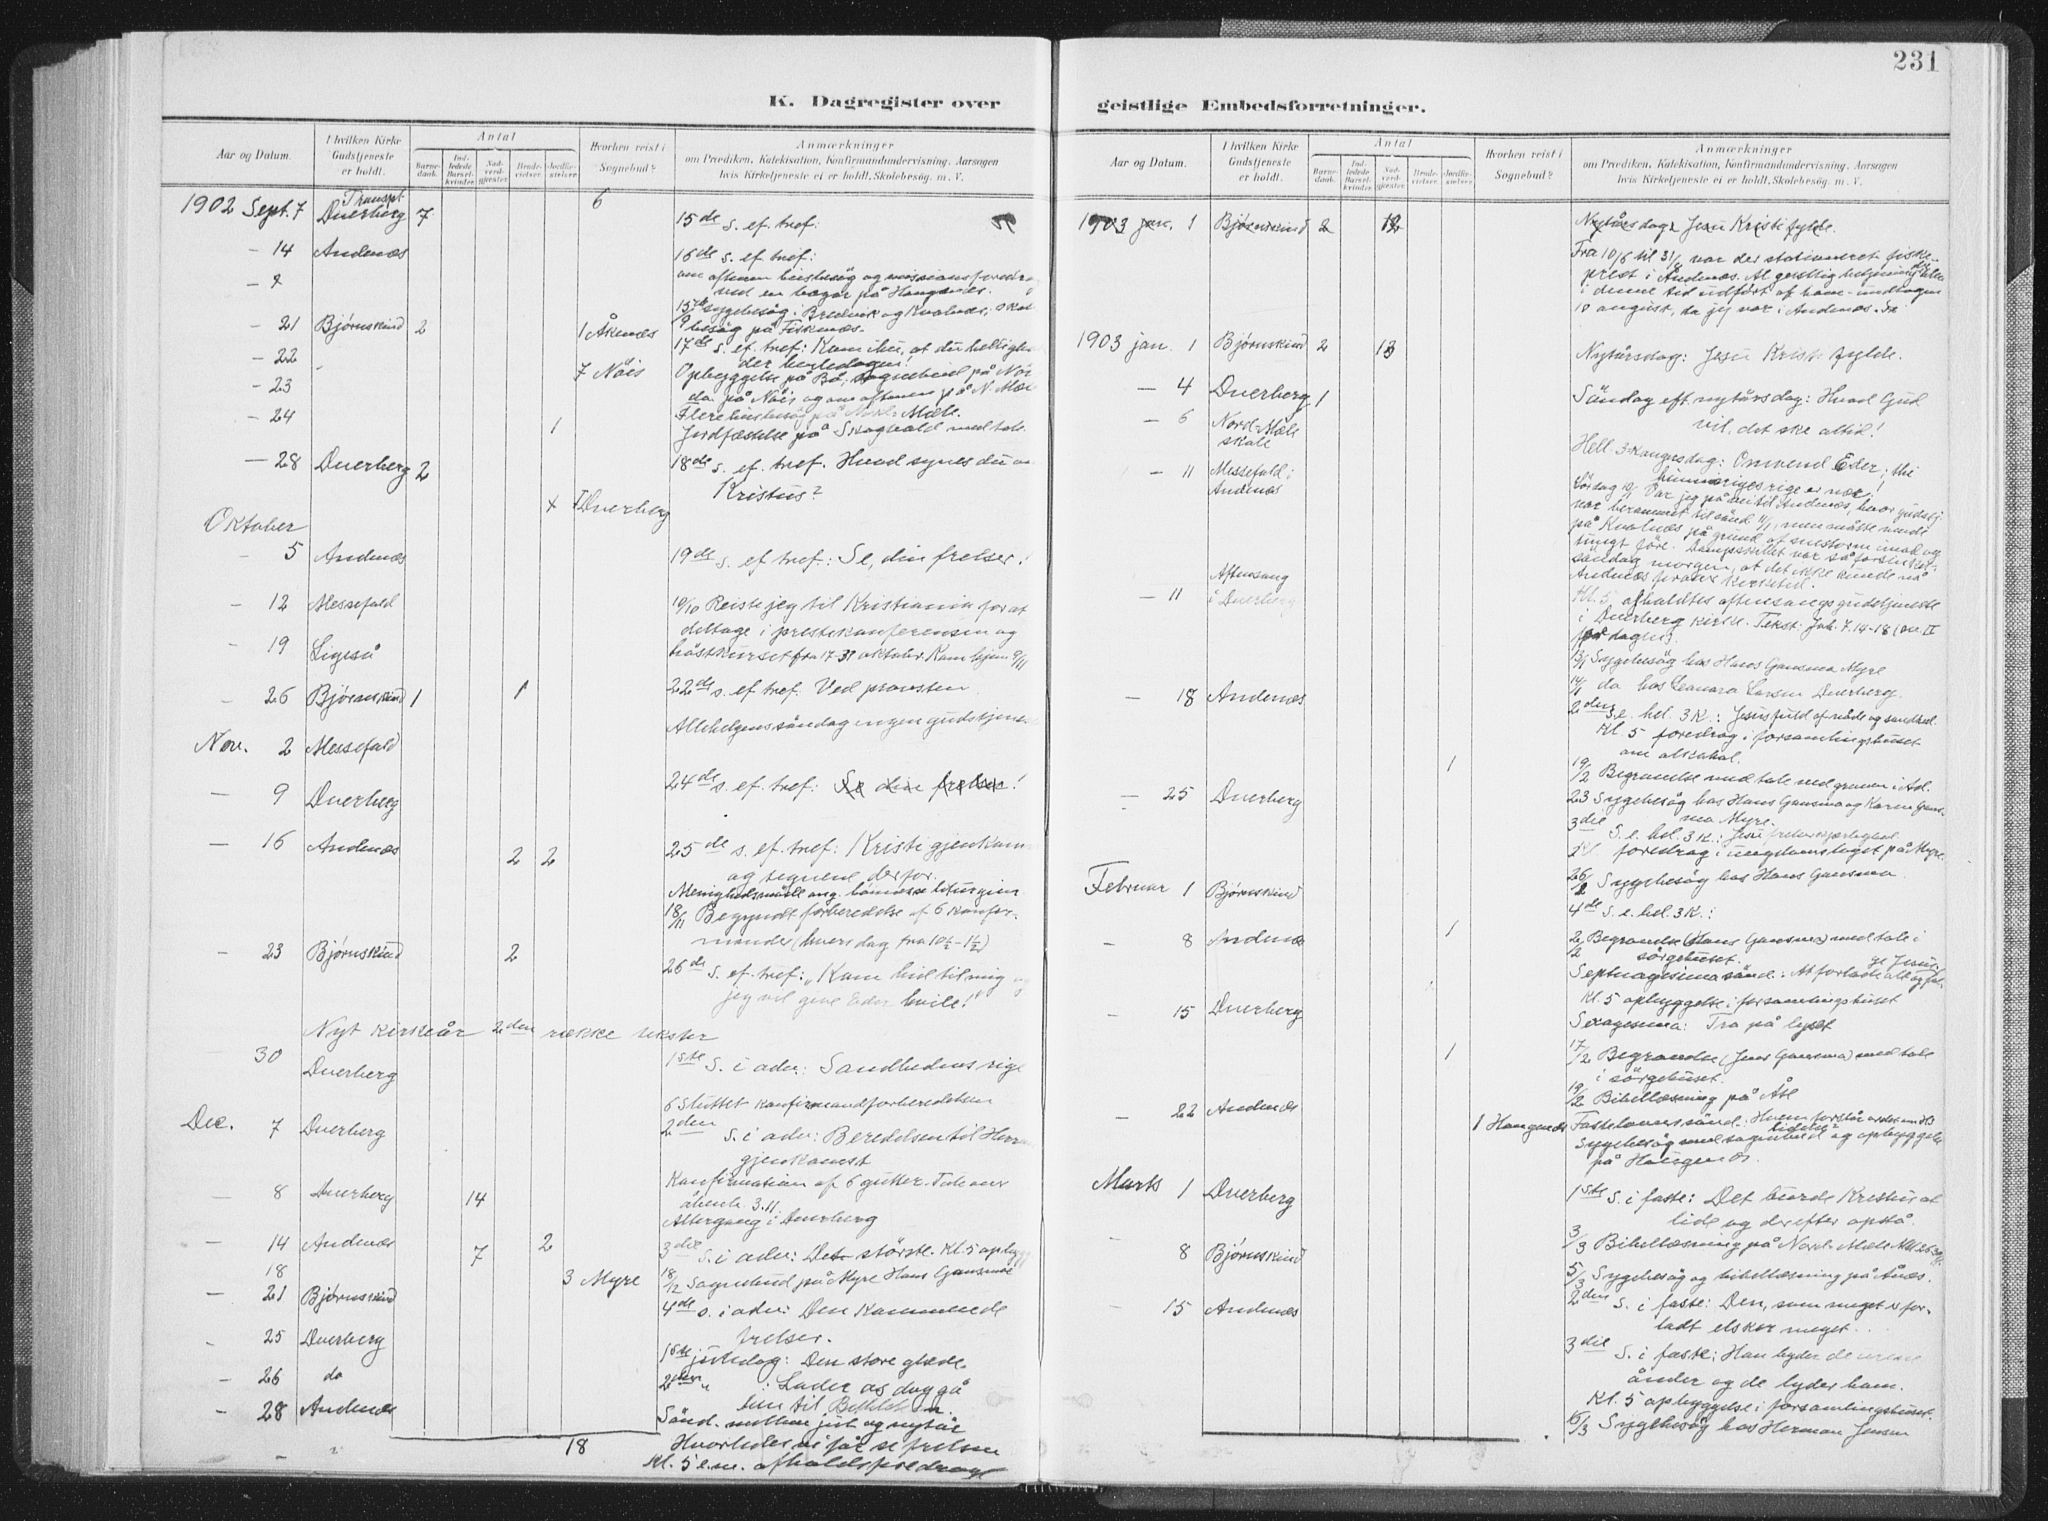 SAT, Ministerialprotokoller, klokkerbøker og fødselsregistre - Nordland, 897/L1400: Ministerialbok nr. 897A07, 1897-1908, s. 231